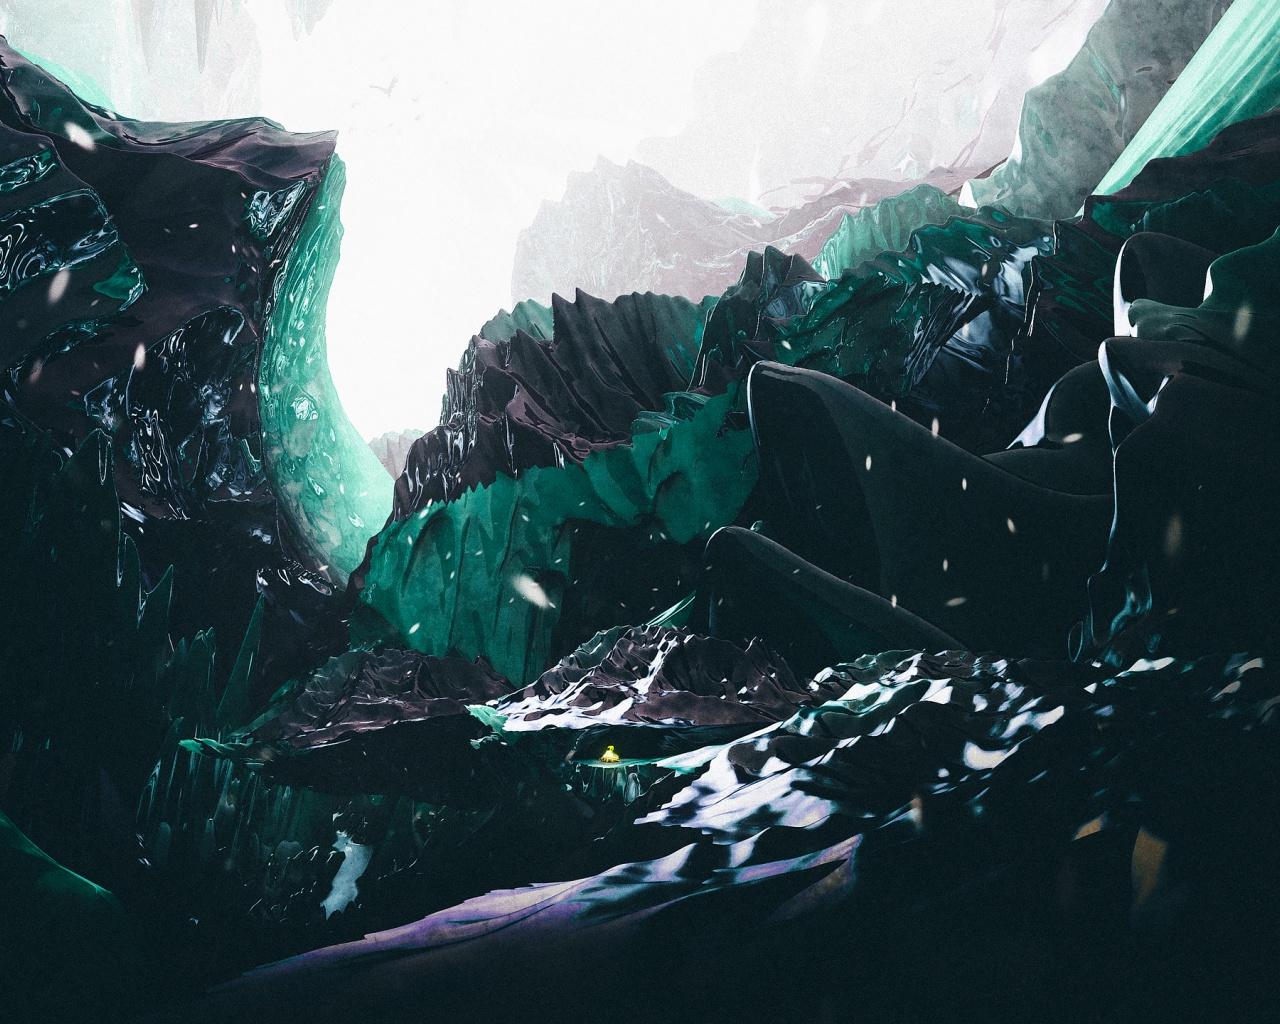 glacier_1280x1024